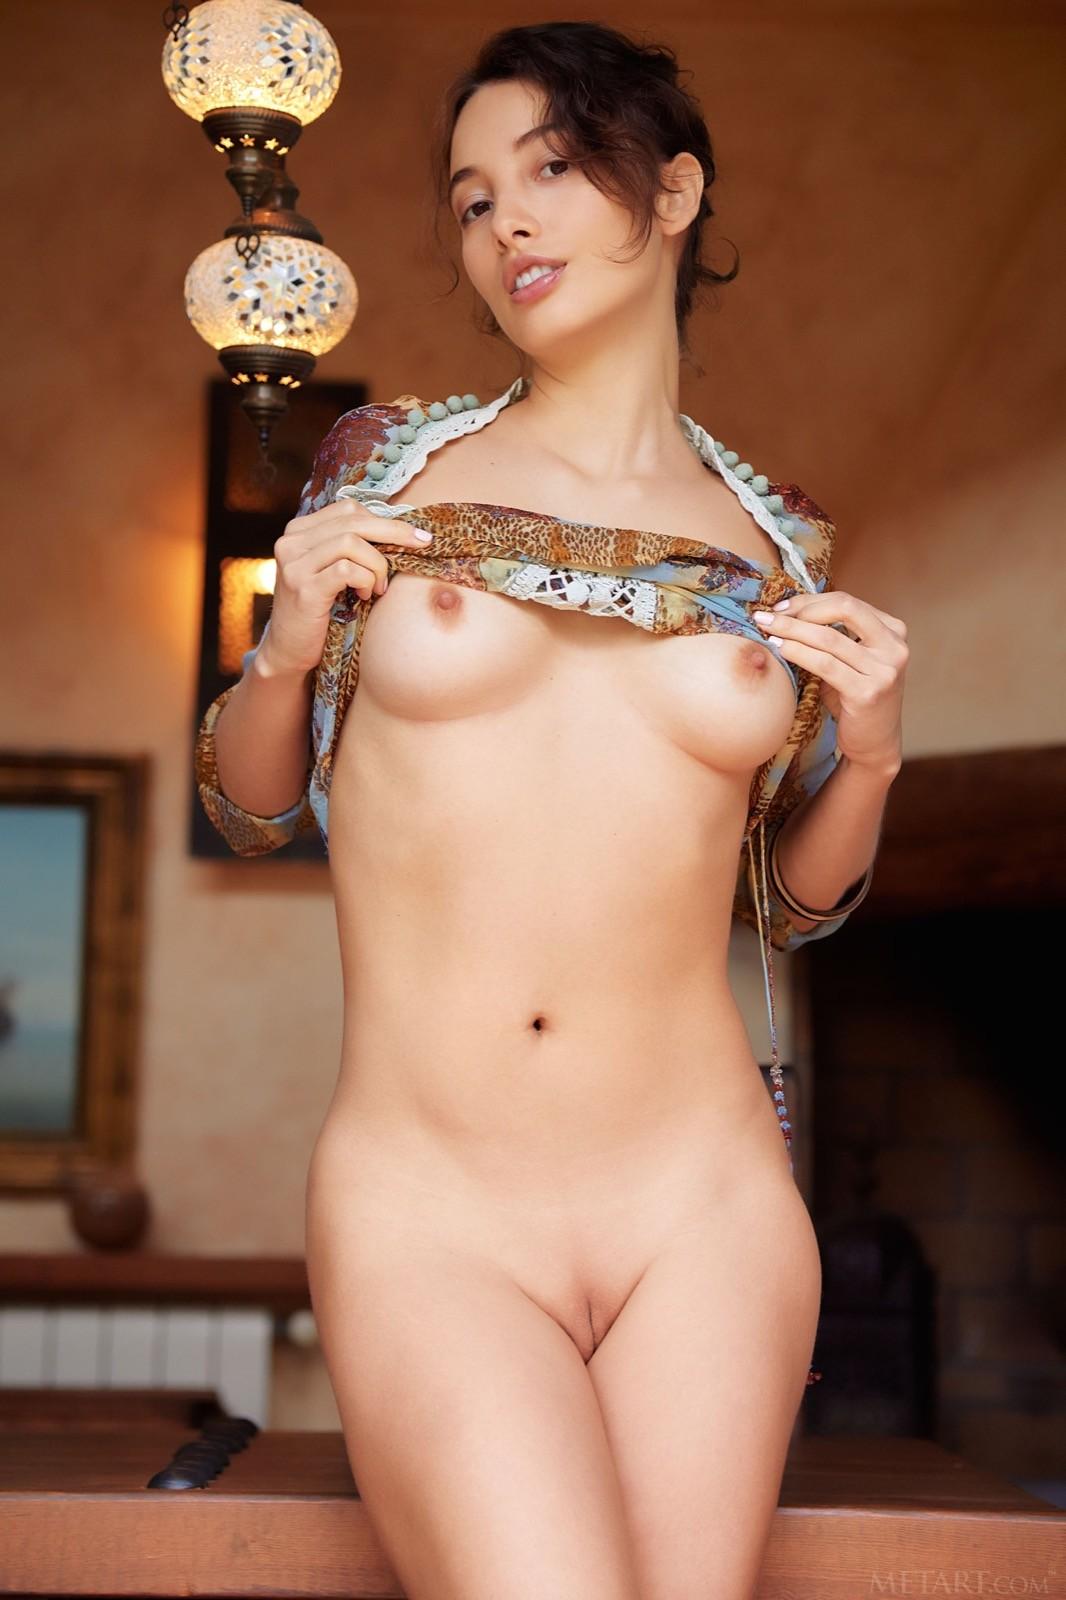 Девушка с красивой бритой киской - фото